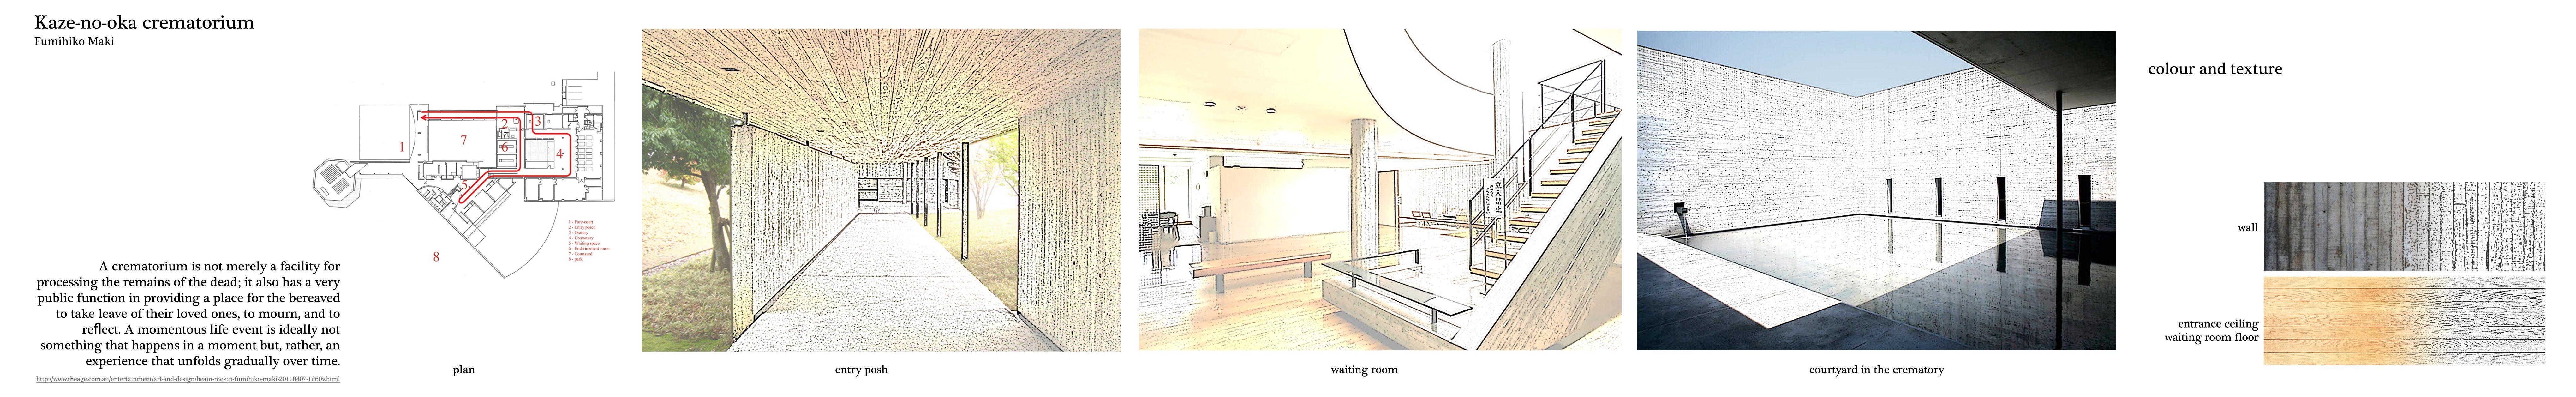 week 6 precedents study Kaze no oka crematorium by Fumihiko Maki colour